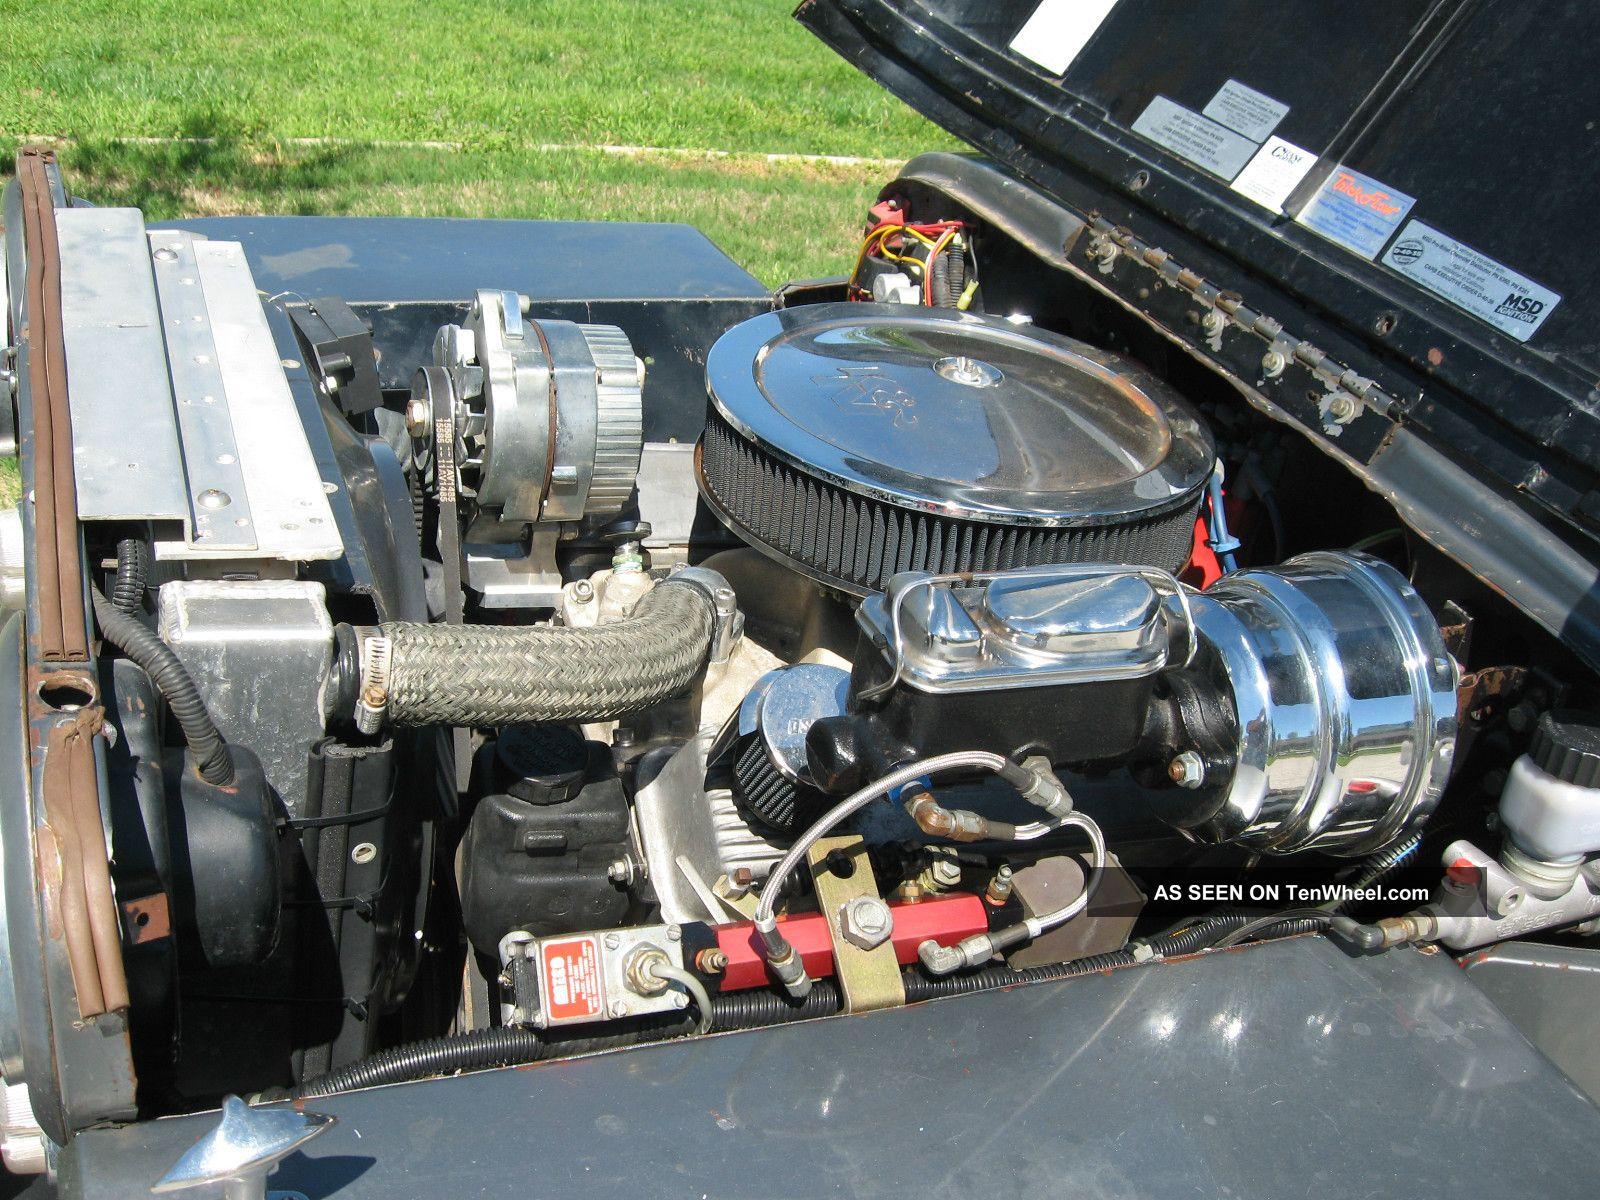 Frame Off Rebuilt 1945 Willys Cj2a 330hp Power Disk Brakes